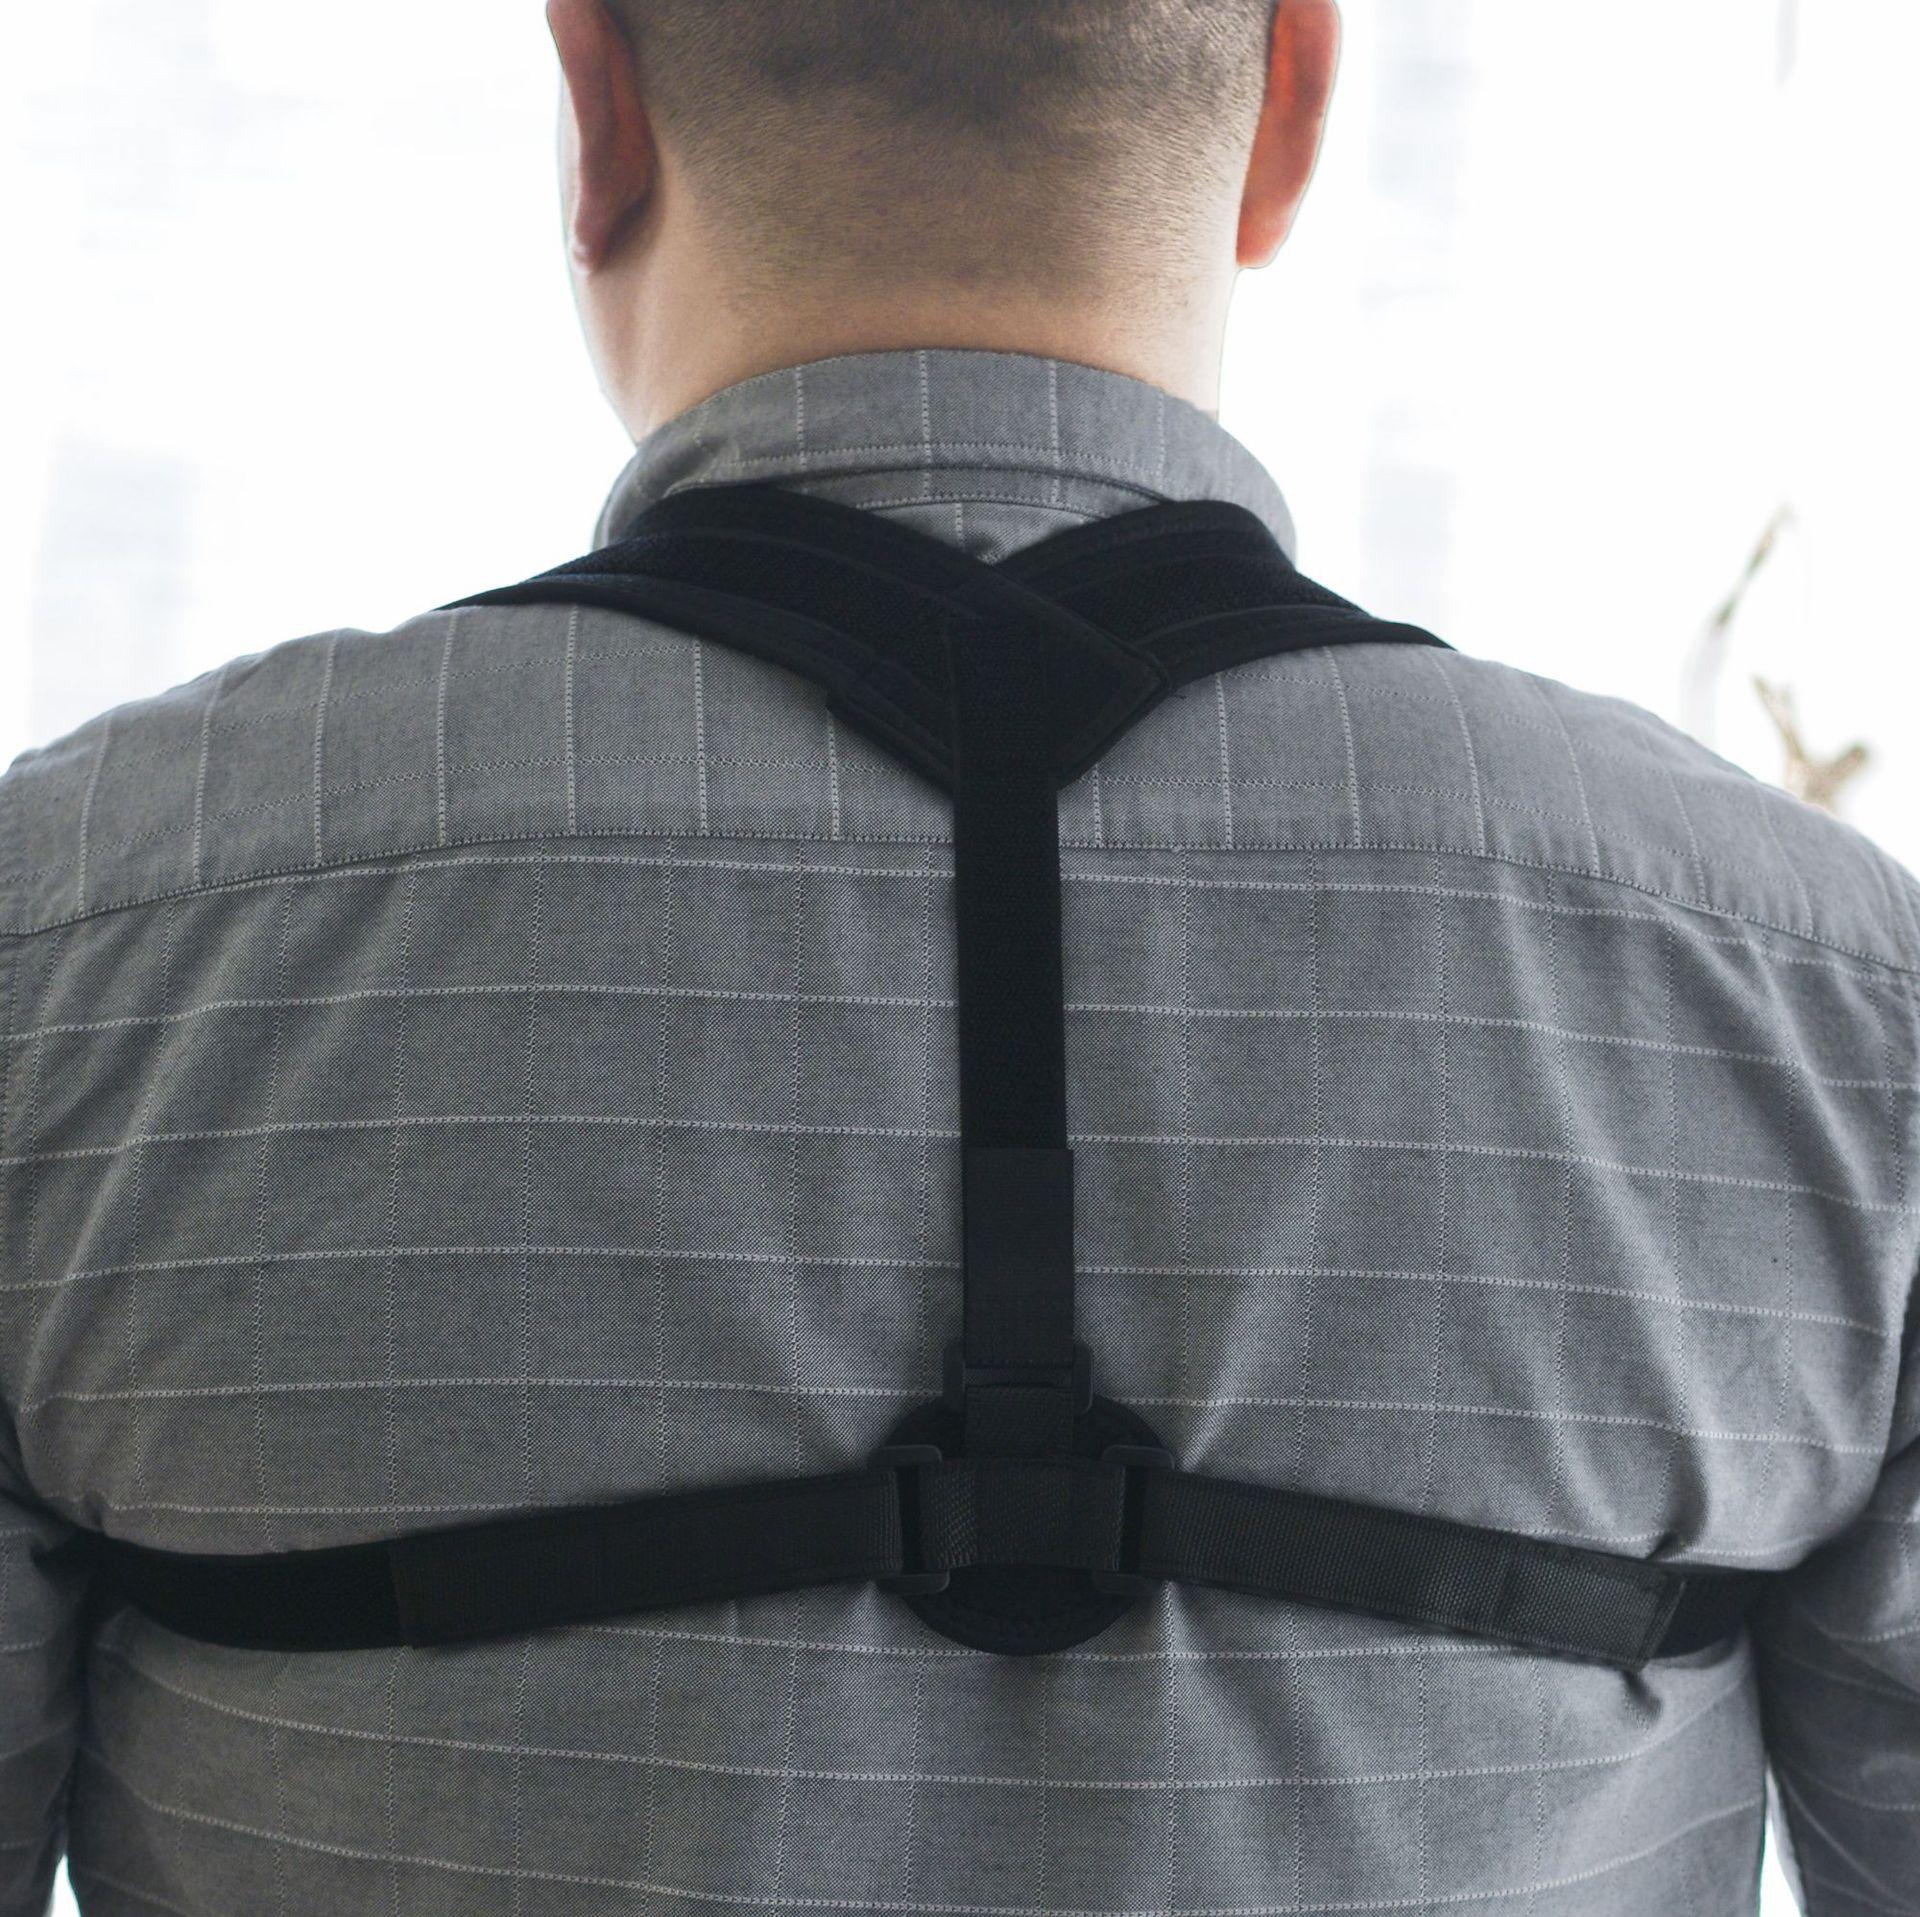 Back Good Adult Correction Hunchback Sitting Straightening With Adult Back Posture Correction Spine Orthotics Band